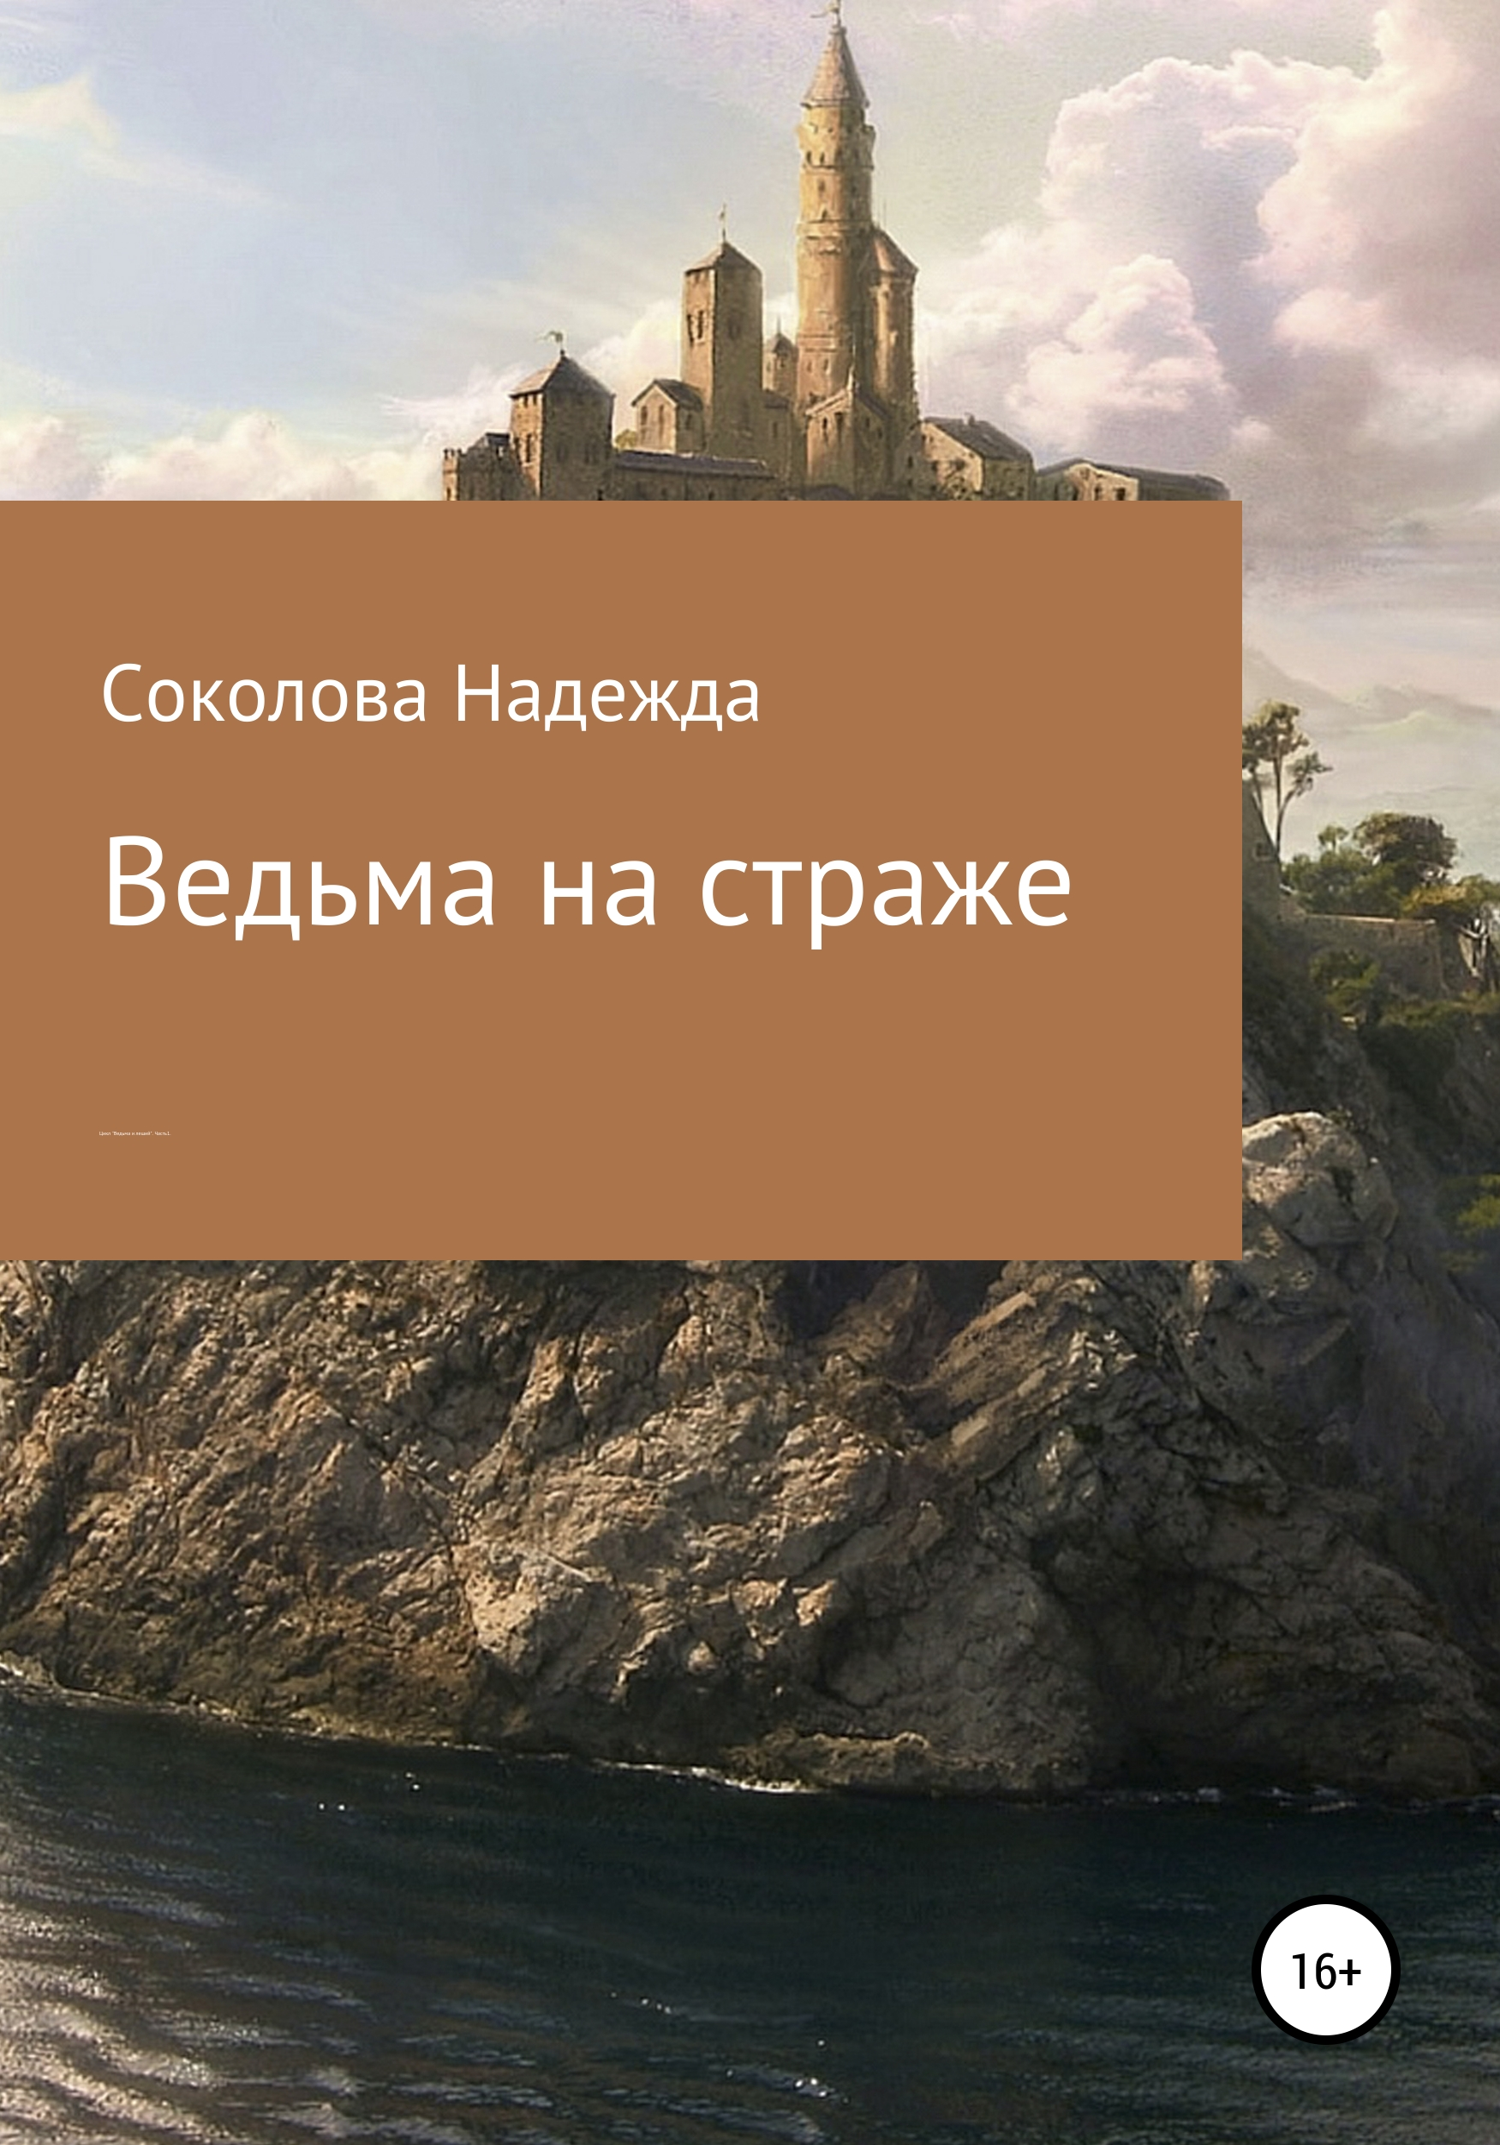 Надежда Игоревна Соколова Ведьма на страже надежда игоревна соколова ведьма и неприятности